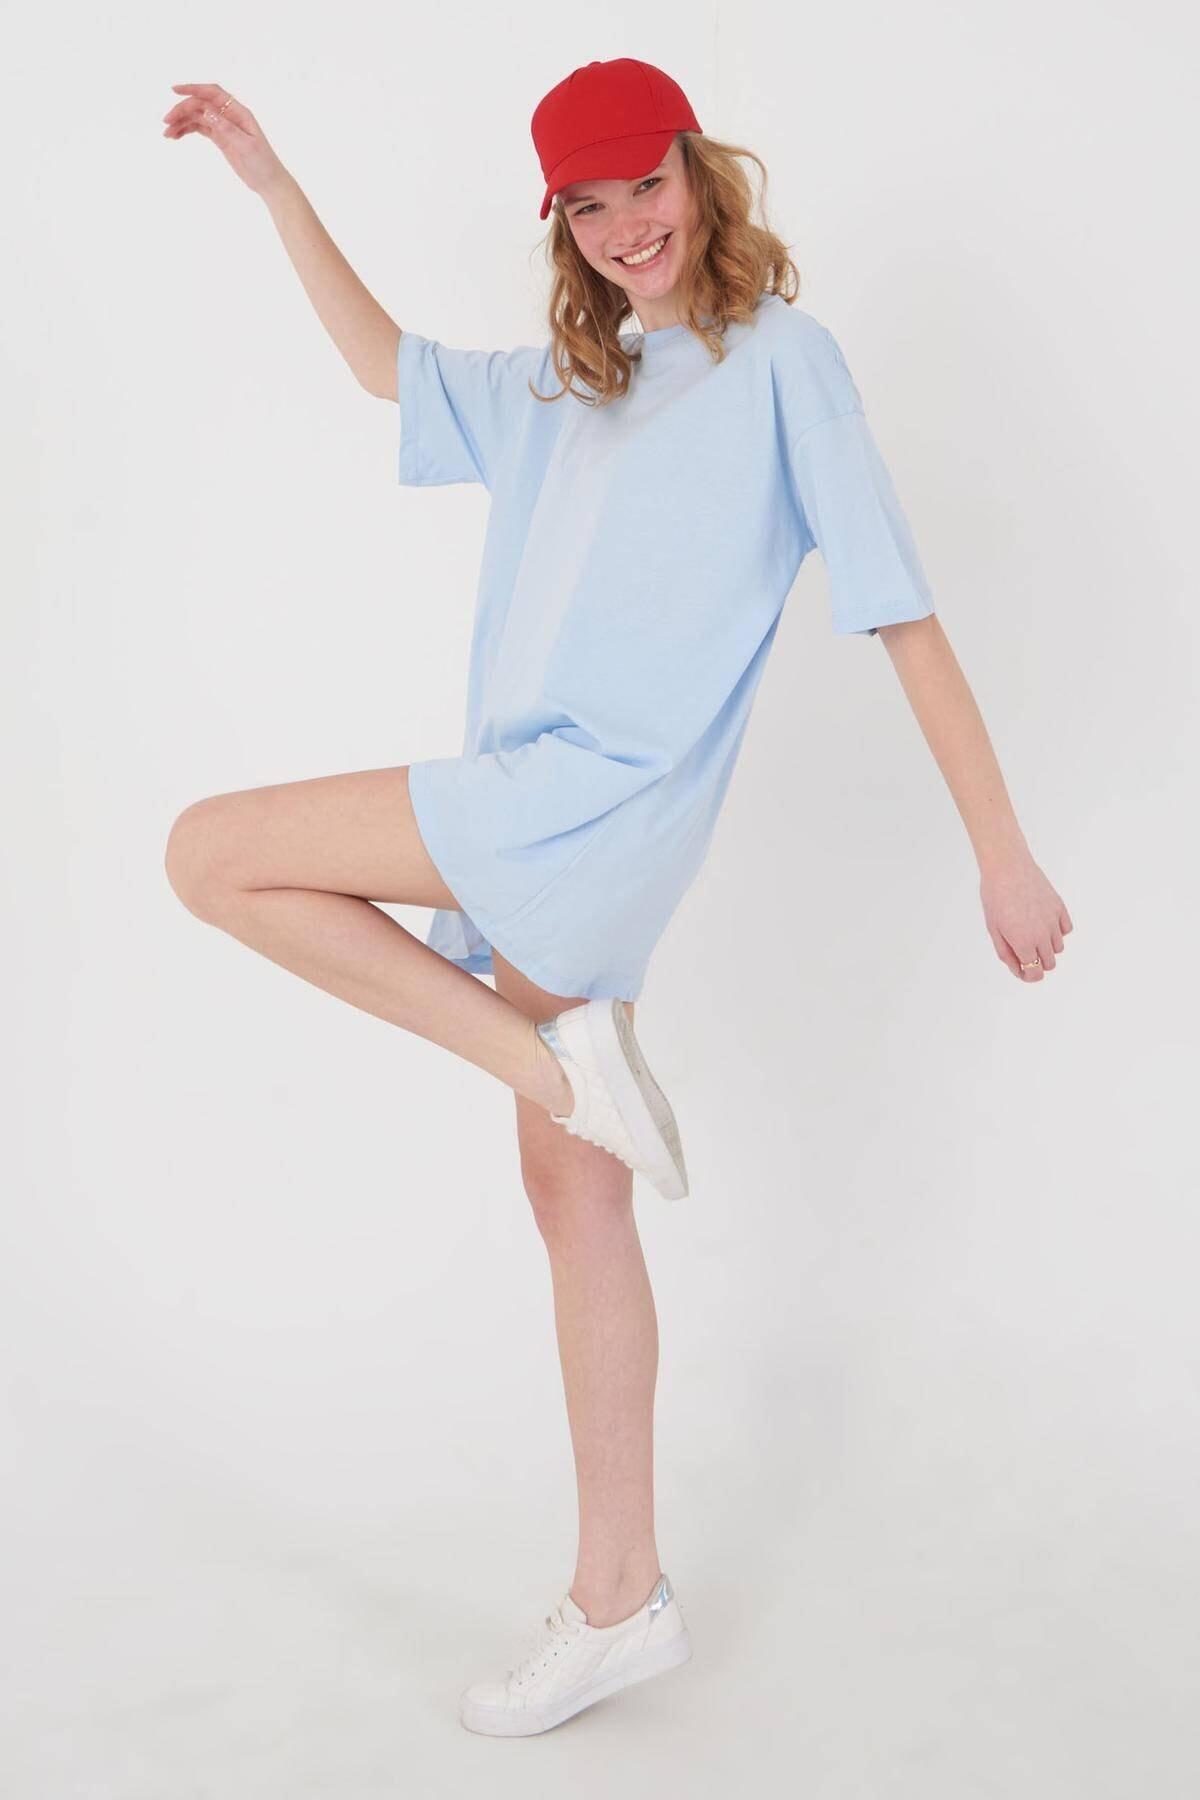 Addax Kadın Buz Mavi Oversize T-Shirt P0731 - G6K7 Adx-0000020596 2